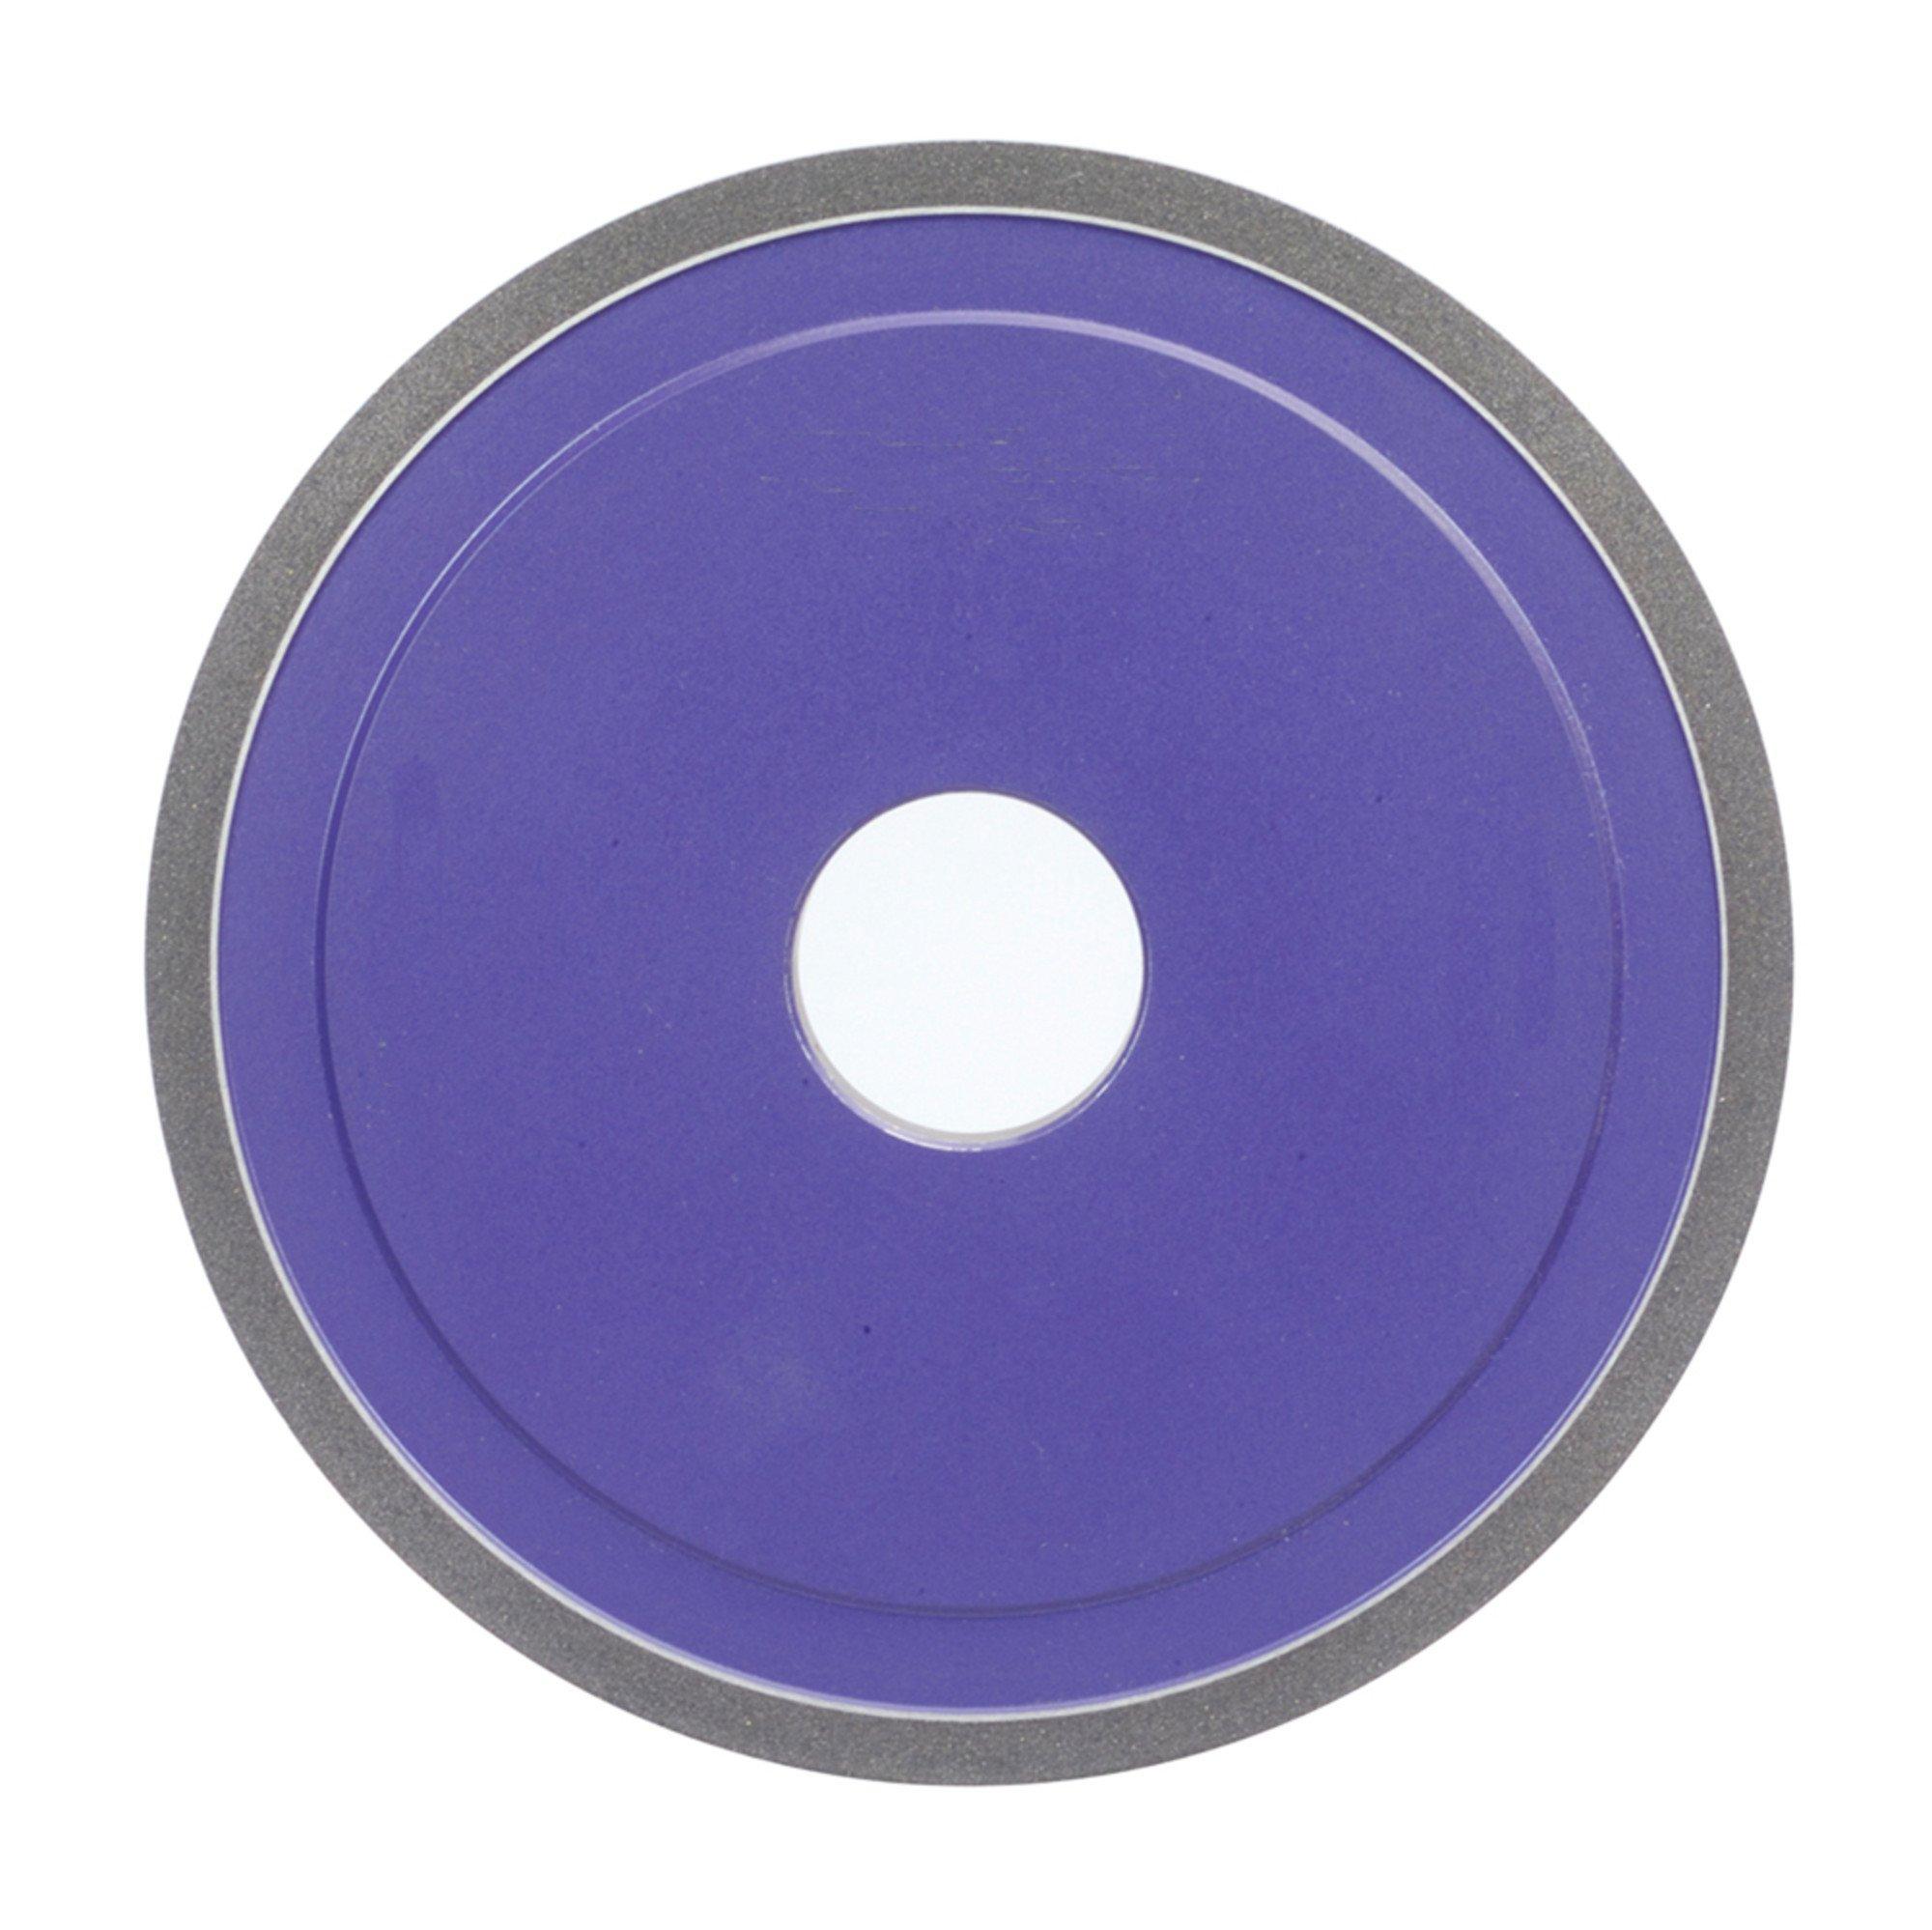 Norton CBN Wheel 7'' Diameter 1/2'' Width 120 Grit Roughing Application D1A1 CBN Wheel